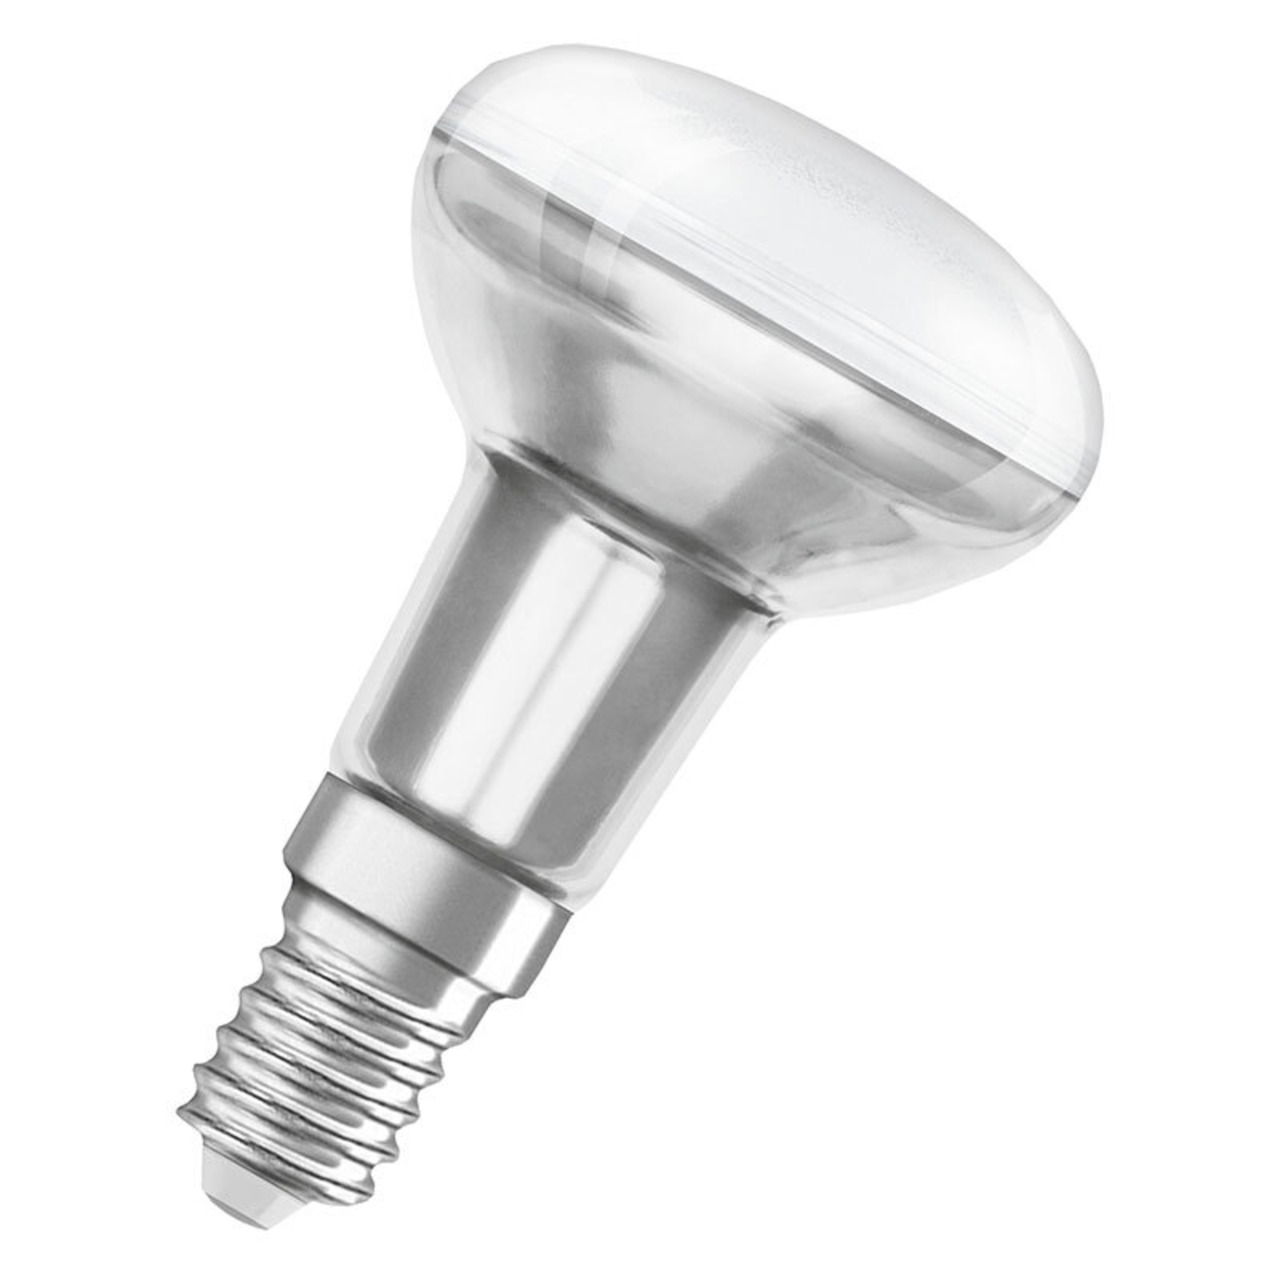 OSRAM LED SUPERSTAR 5-9-W-R50-LED-Reflektorlampe E14- warmweiss- 90 Ra- dimmbar